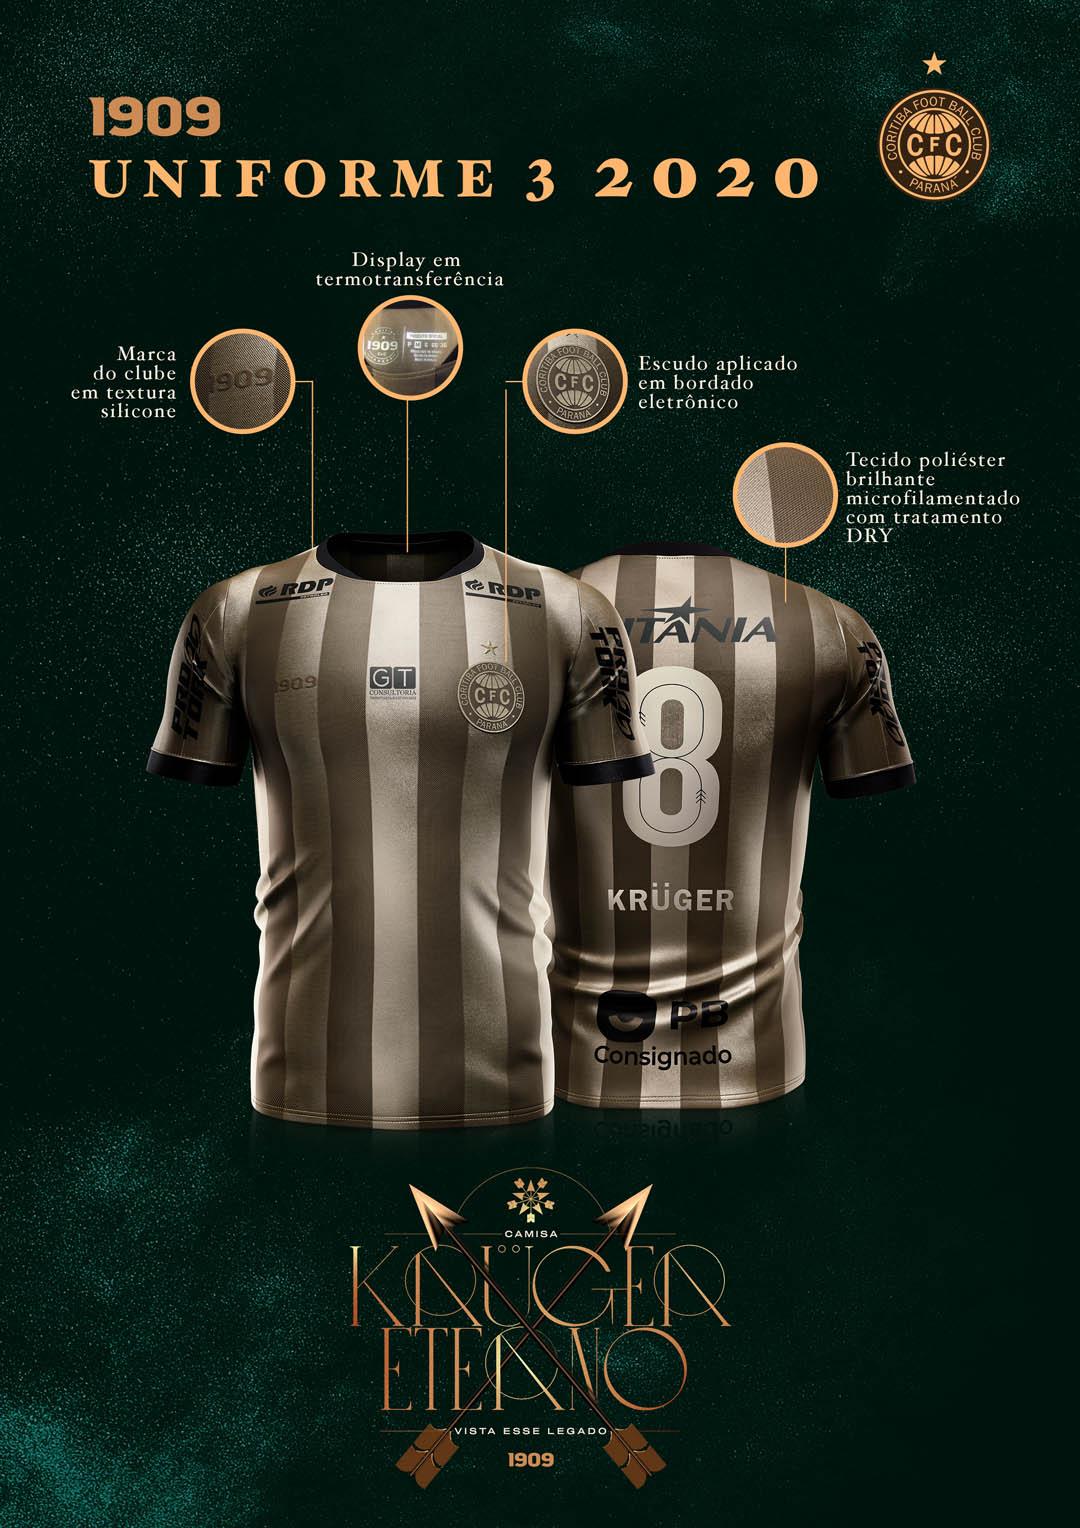 Krüger Eterno Terceira camisa do Coritiba 2020-2021 1909 kit